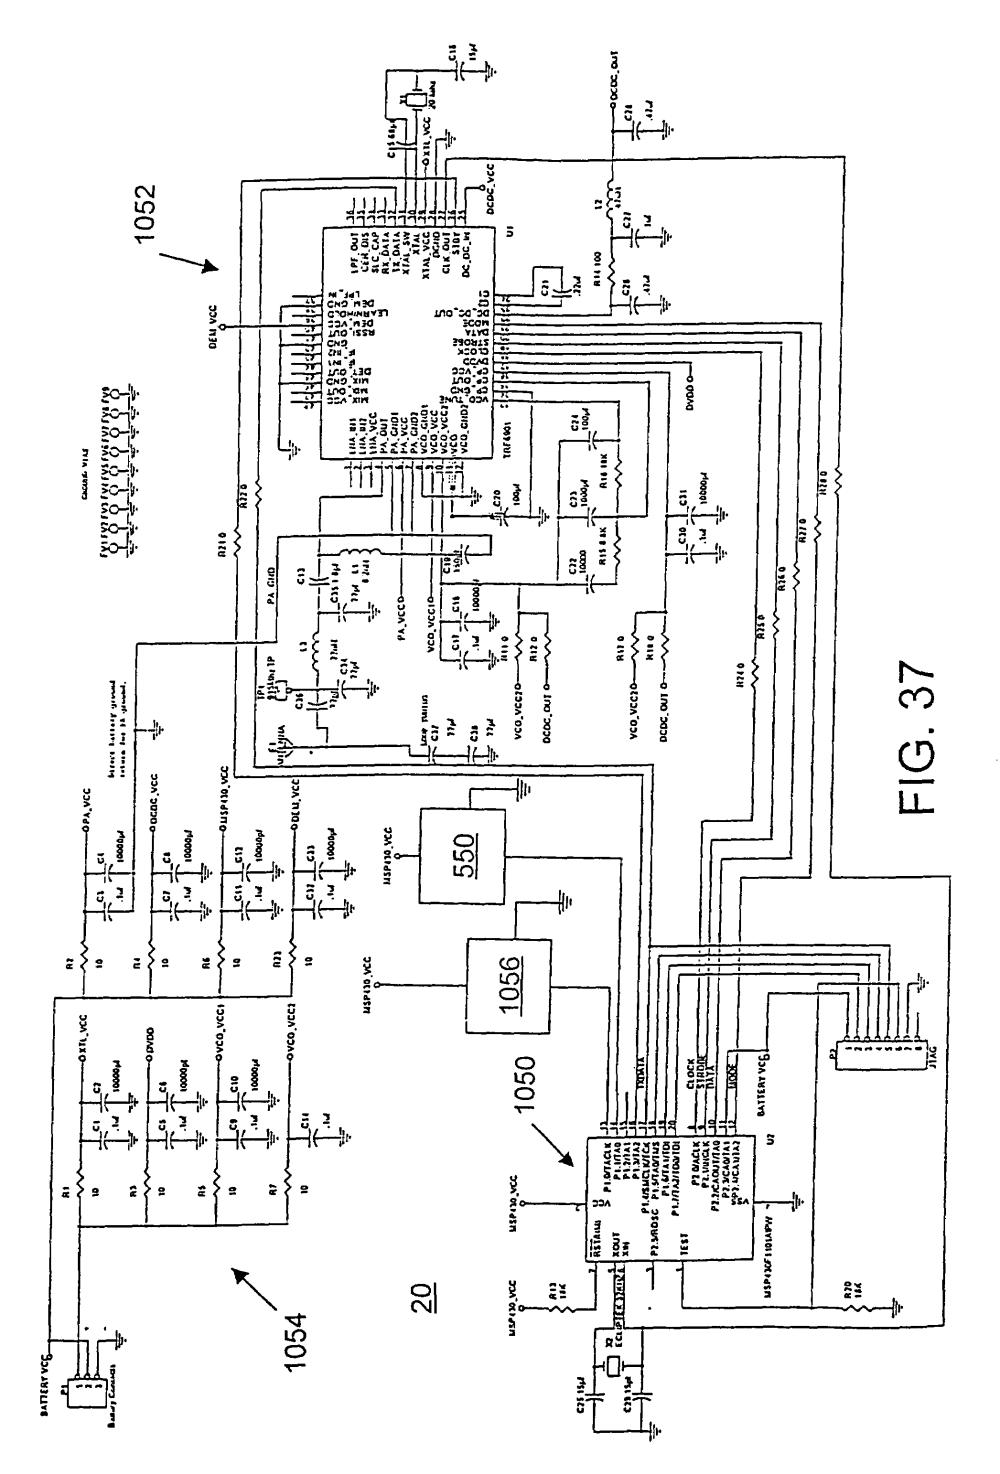 medium resolution of 2001 prowler wiring diagram imageresizertool com mitsubishi mini split system wiring diagram mitsubishi mini truck wiring